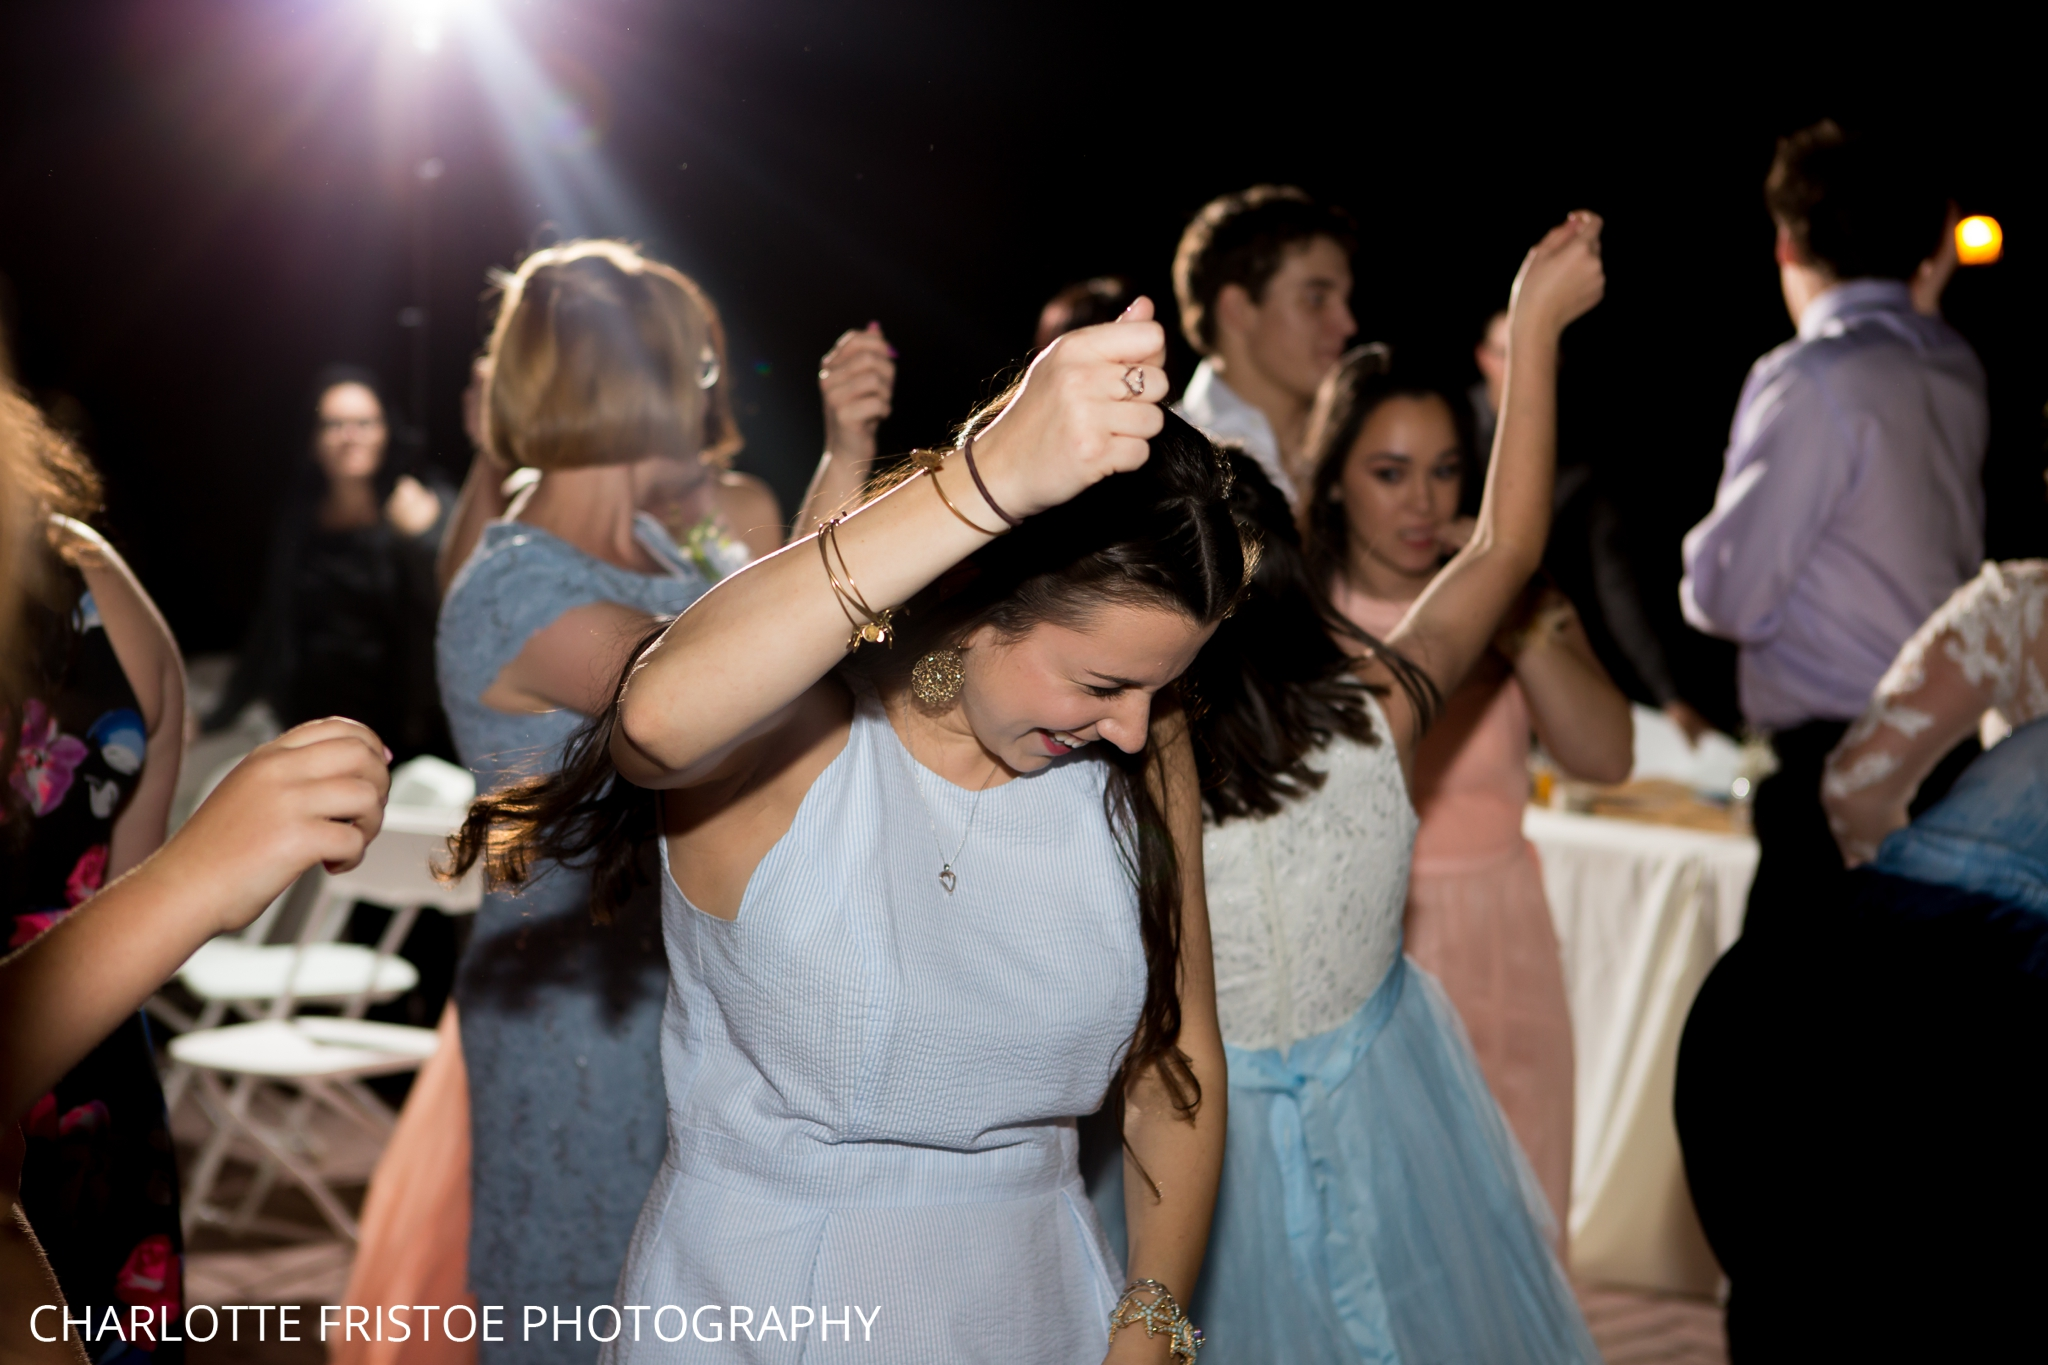 Charlotte Fristoe Photography Wedding-64.jpg